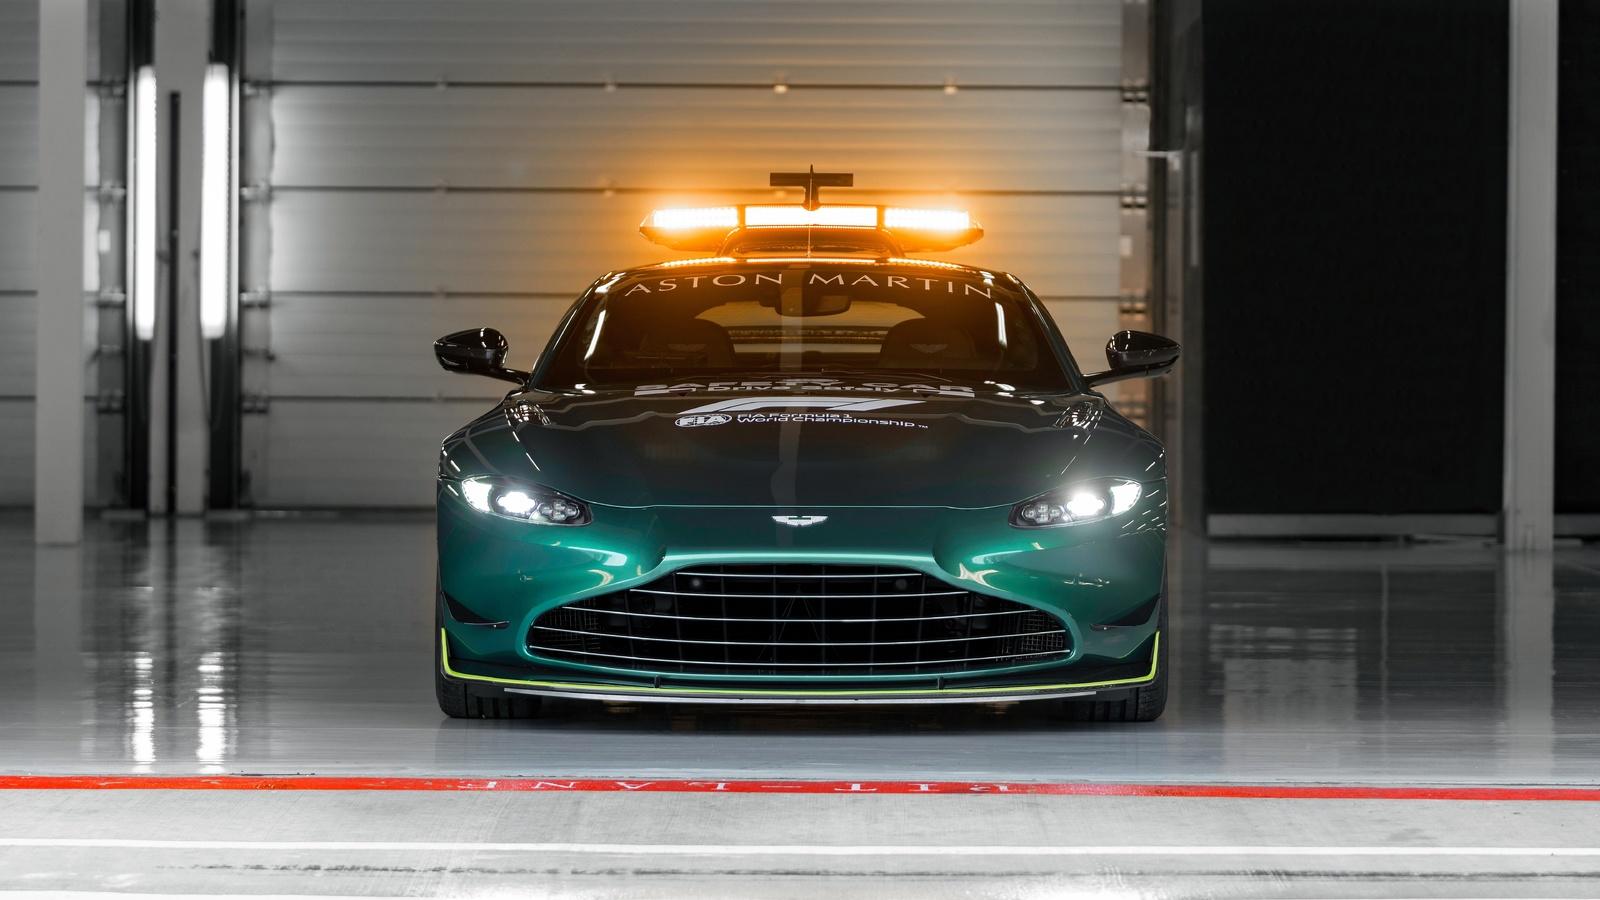 aston martin, vantage, f1, safety, car, 2021